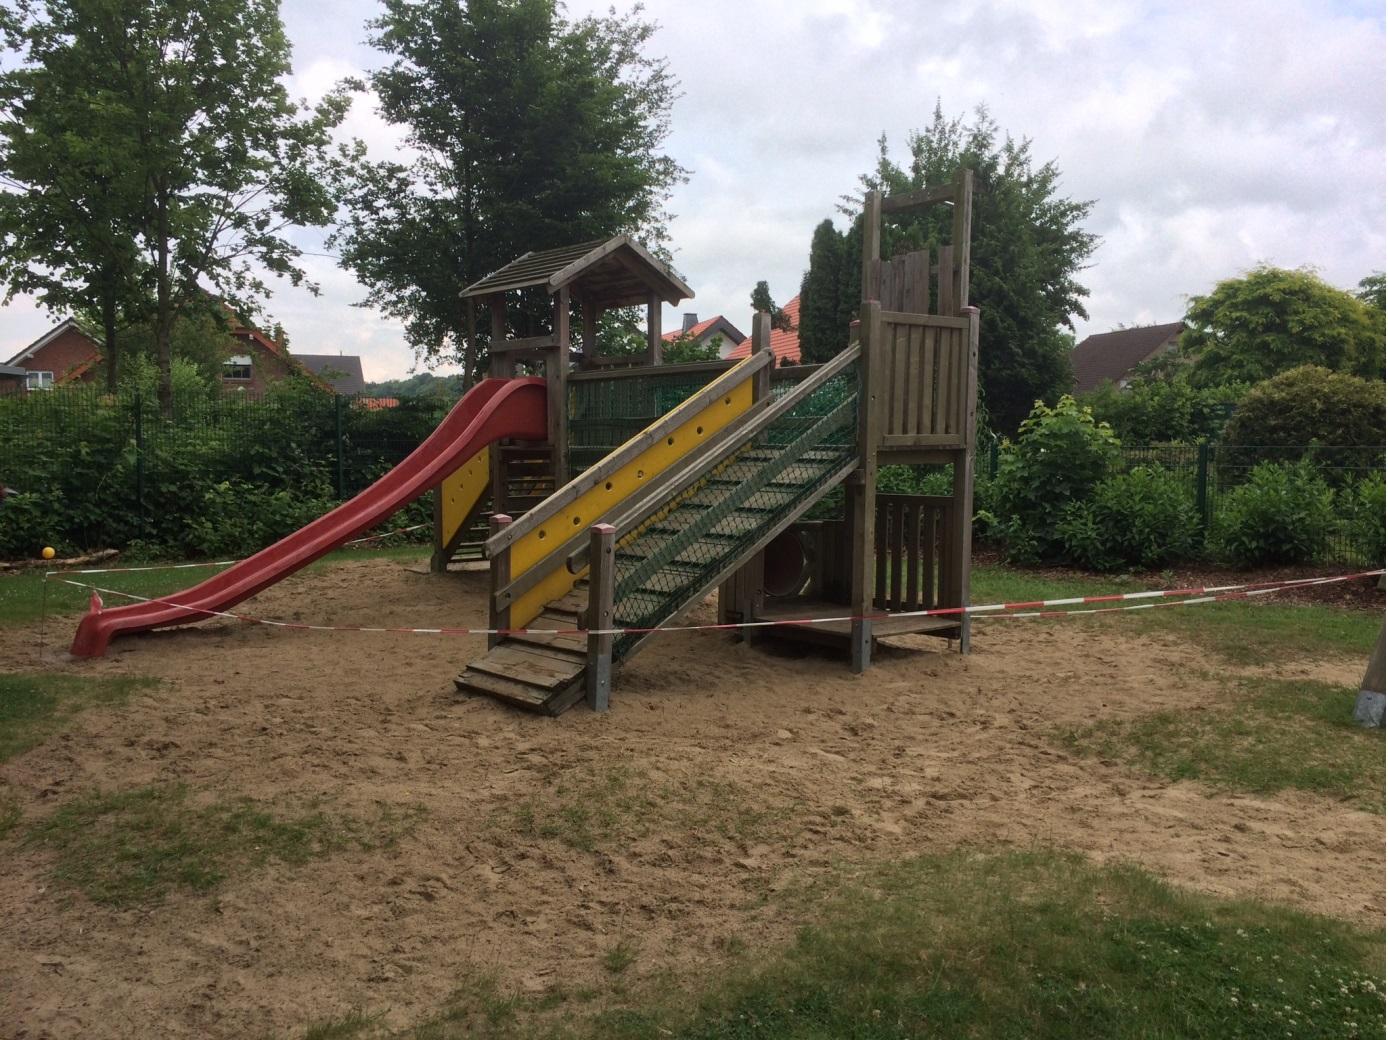 Klettergerüst U3 : Förderverein des kindergartens schilfkorb